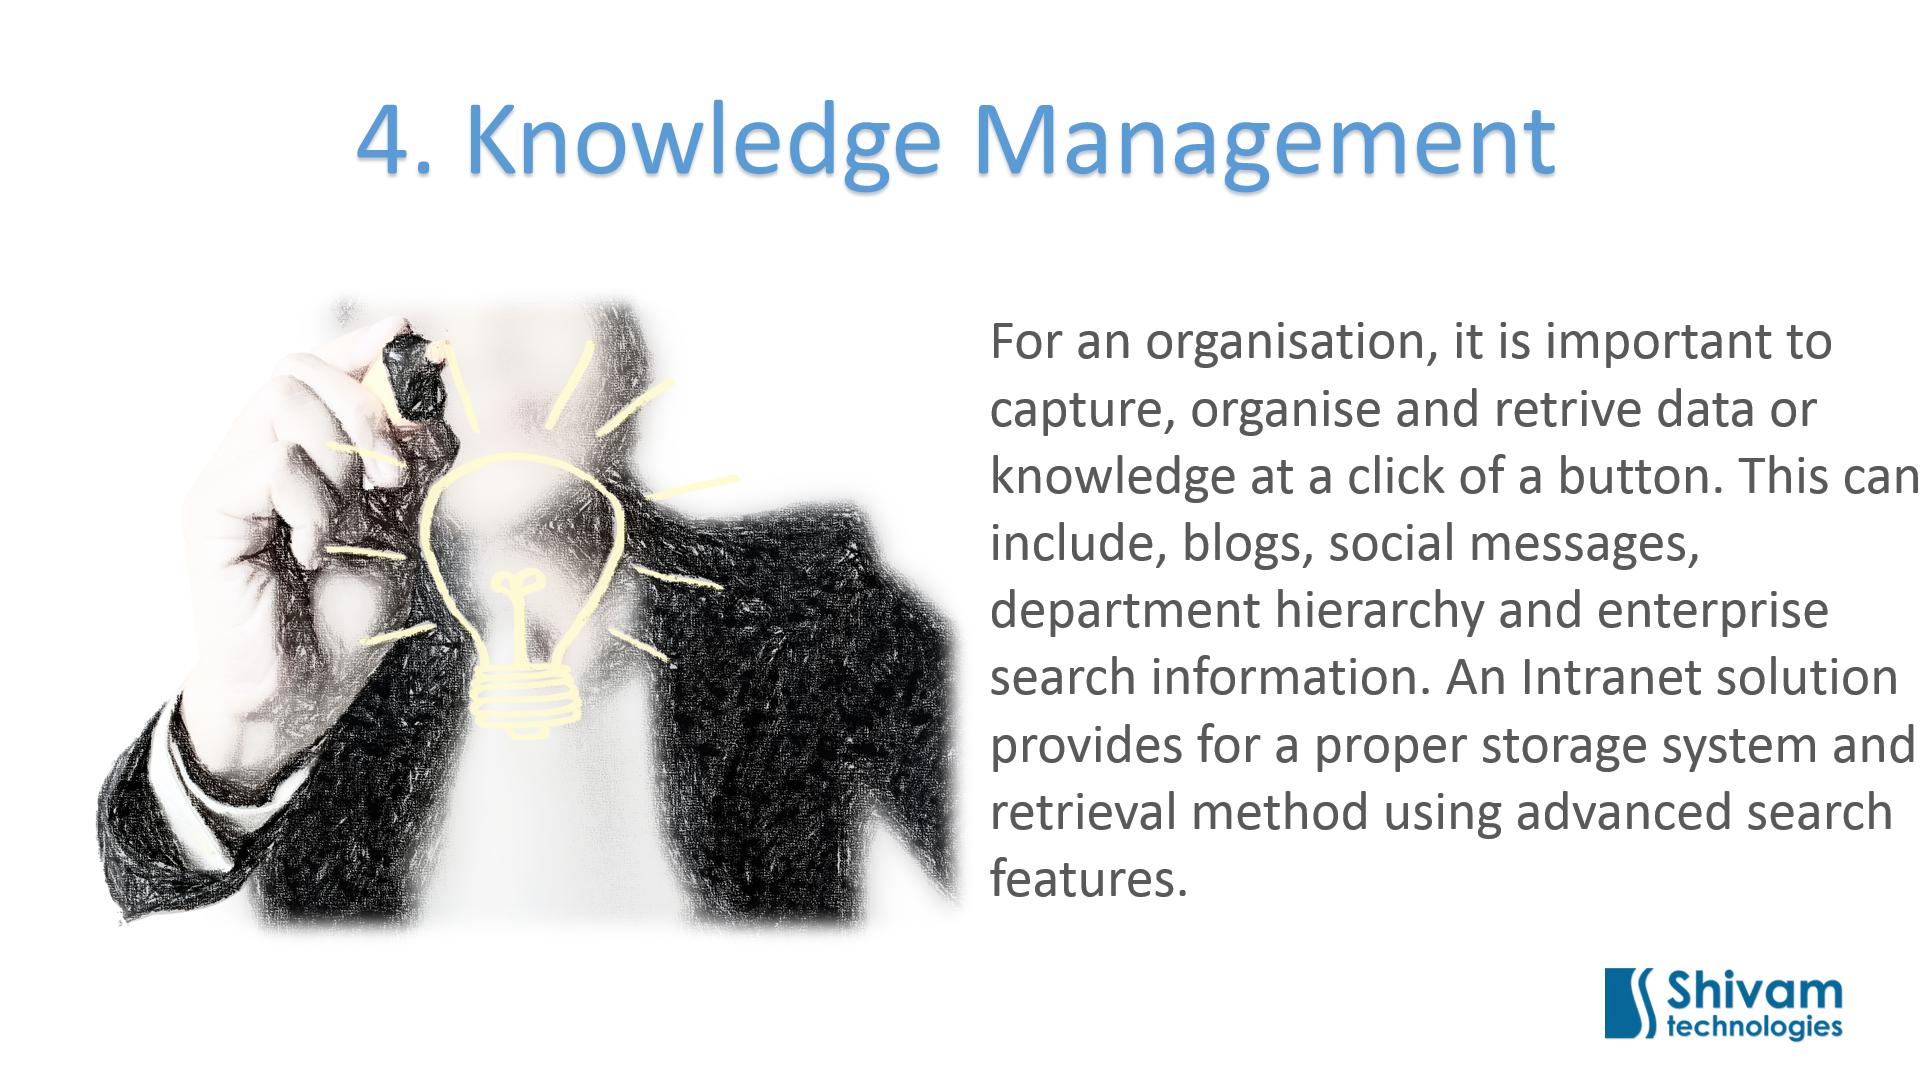 4. Knowledge Management